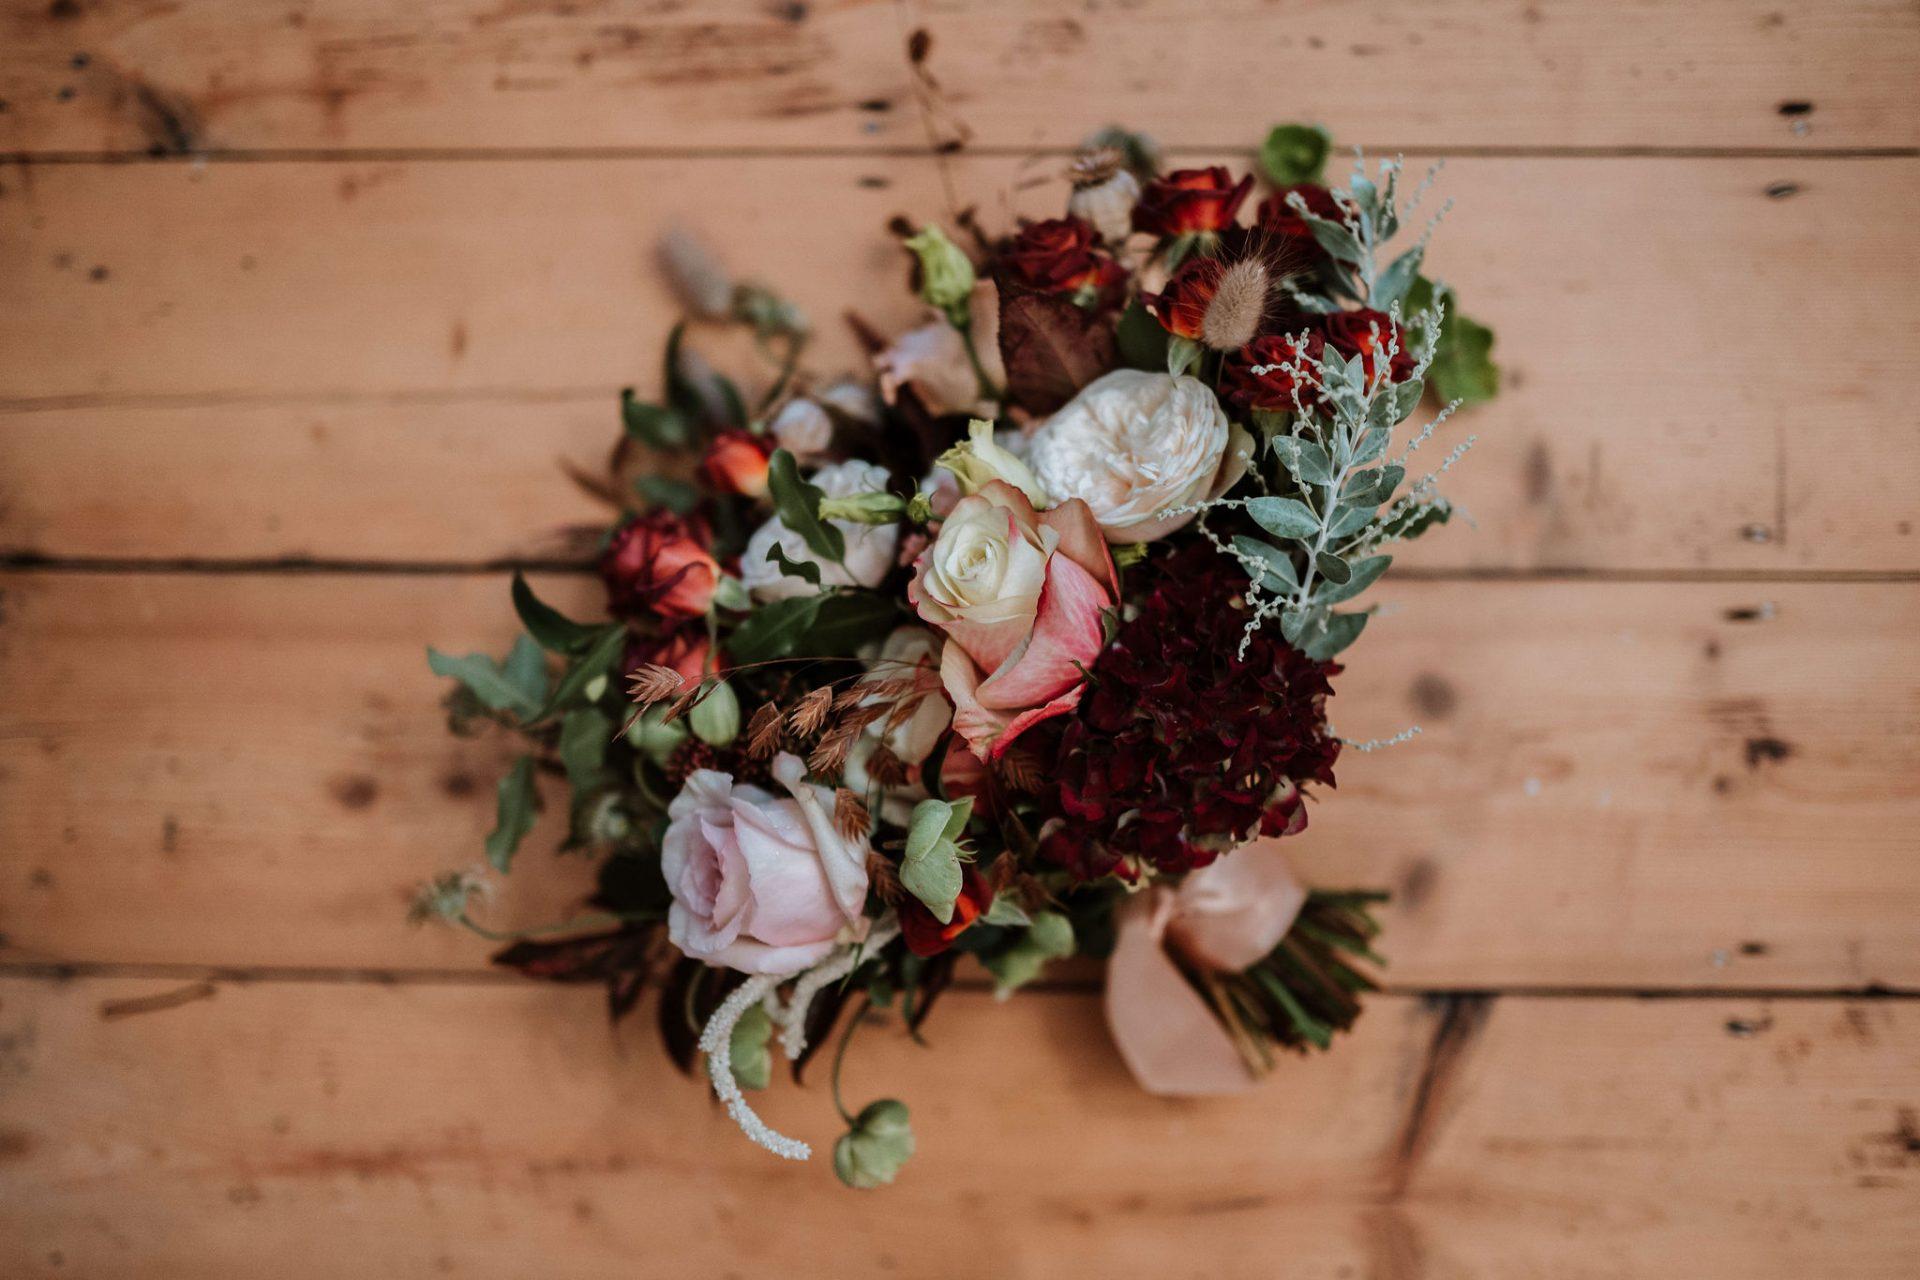 burgundy winter wedding bouquet on wooden floor